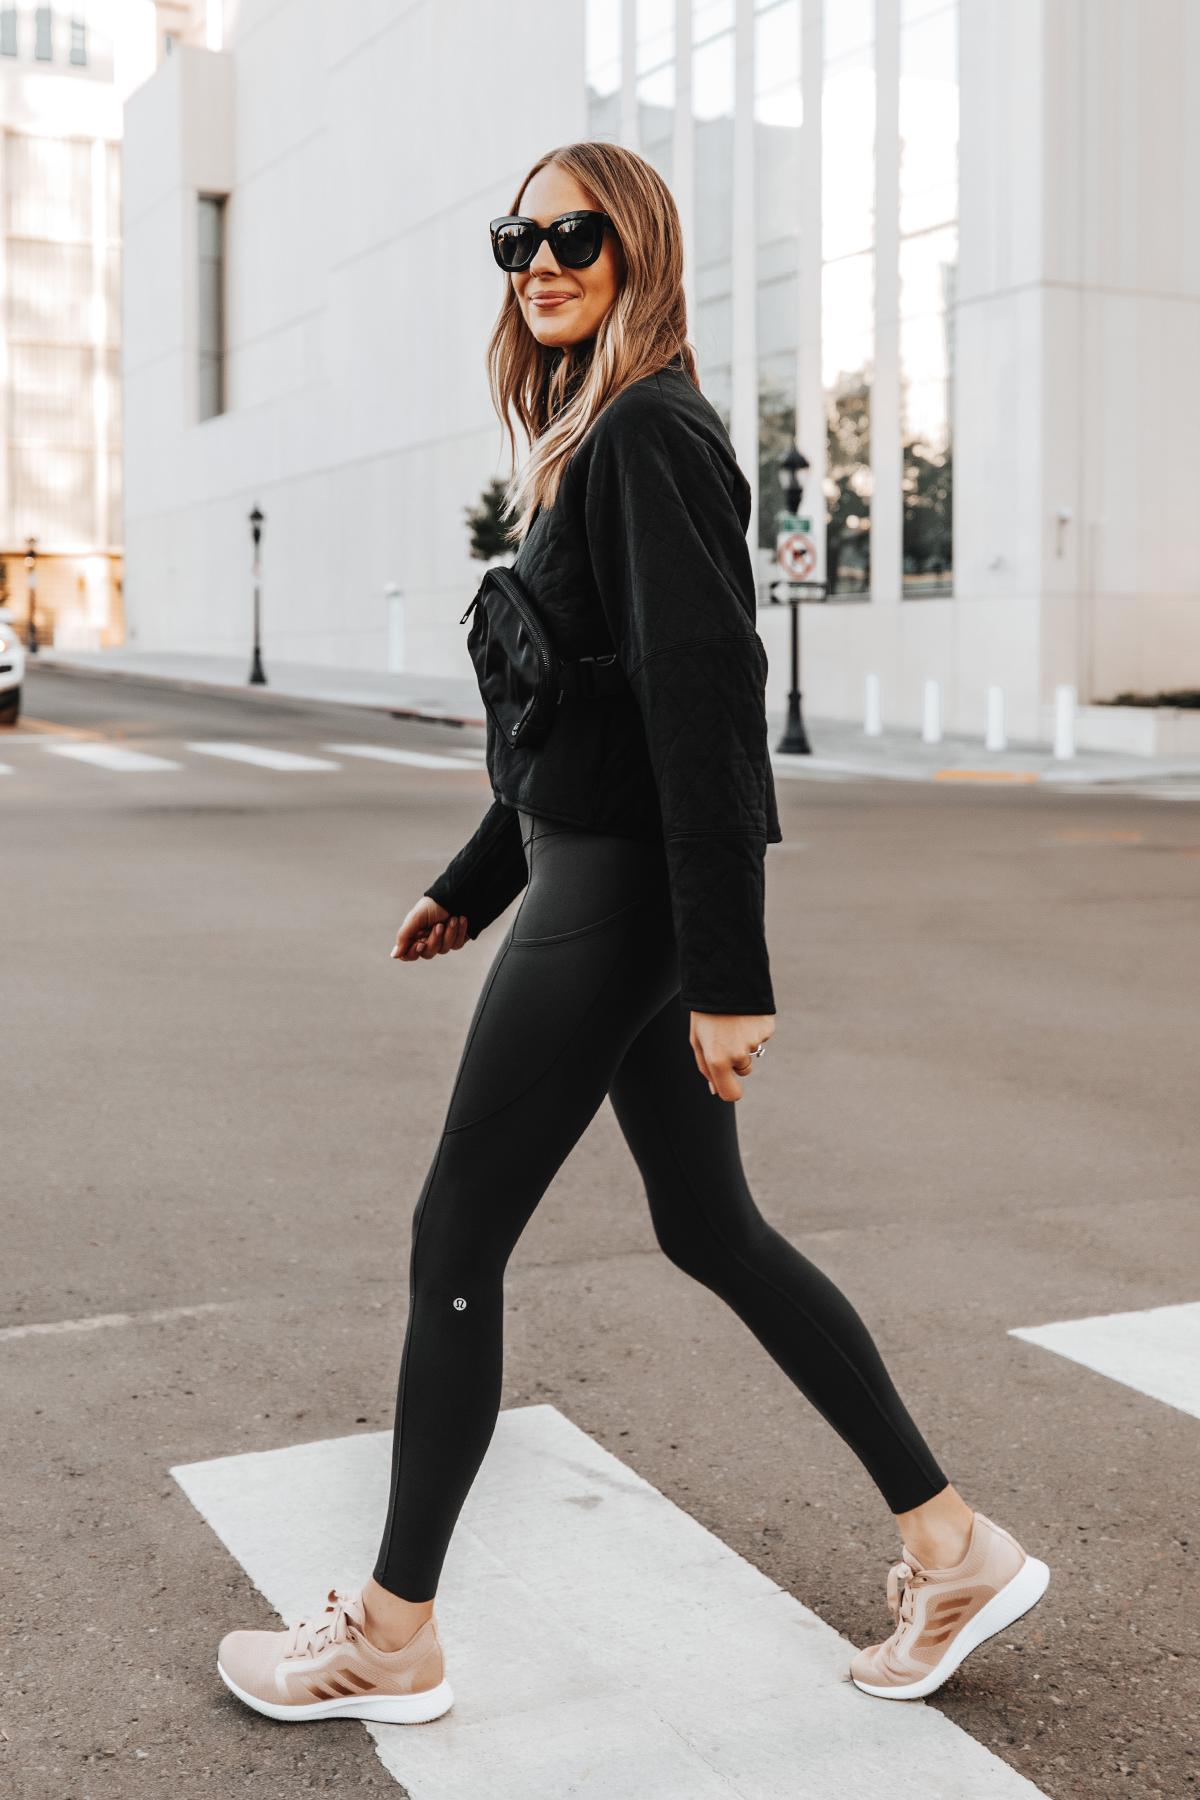 Fashion Jackson Wearing lululemon Black Outfit adidas Blush Sneakers